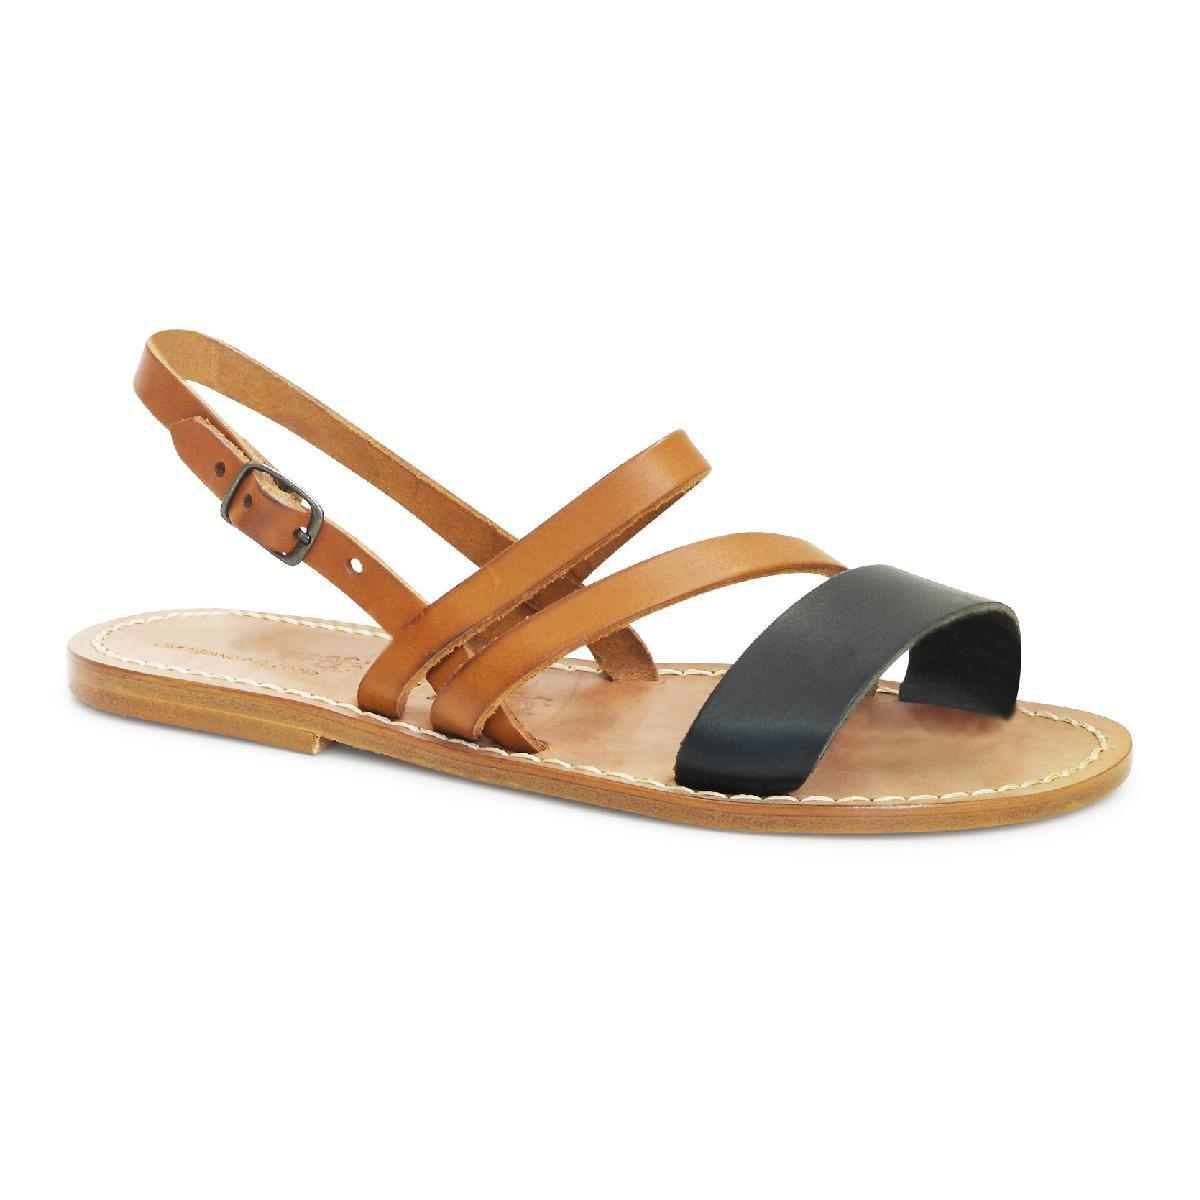 uk availability 286e9 d2036 Flache Damen-Sandalen aus braunem und schwarzem Leder